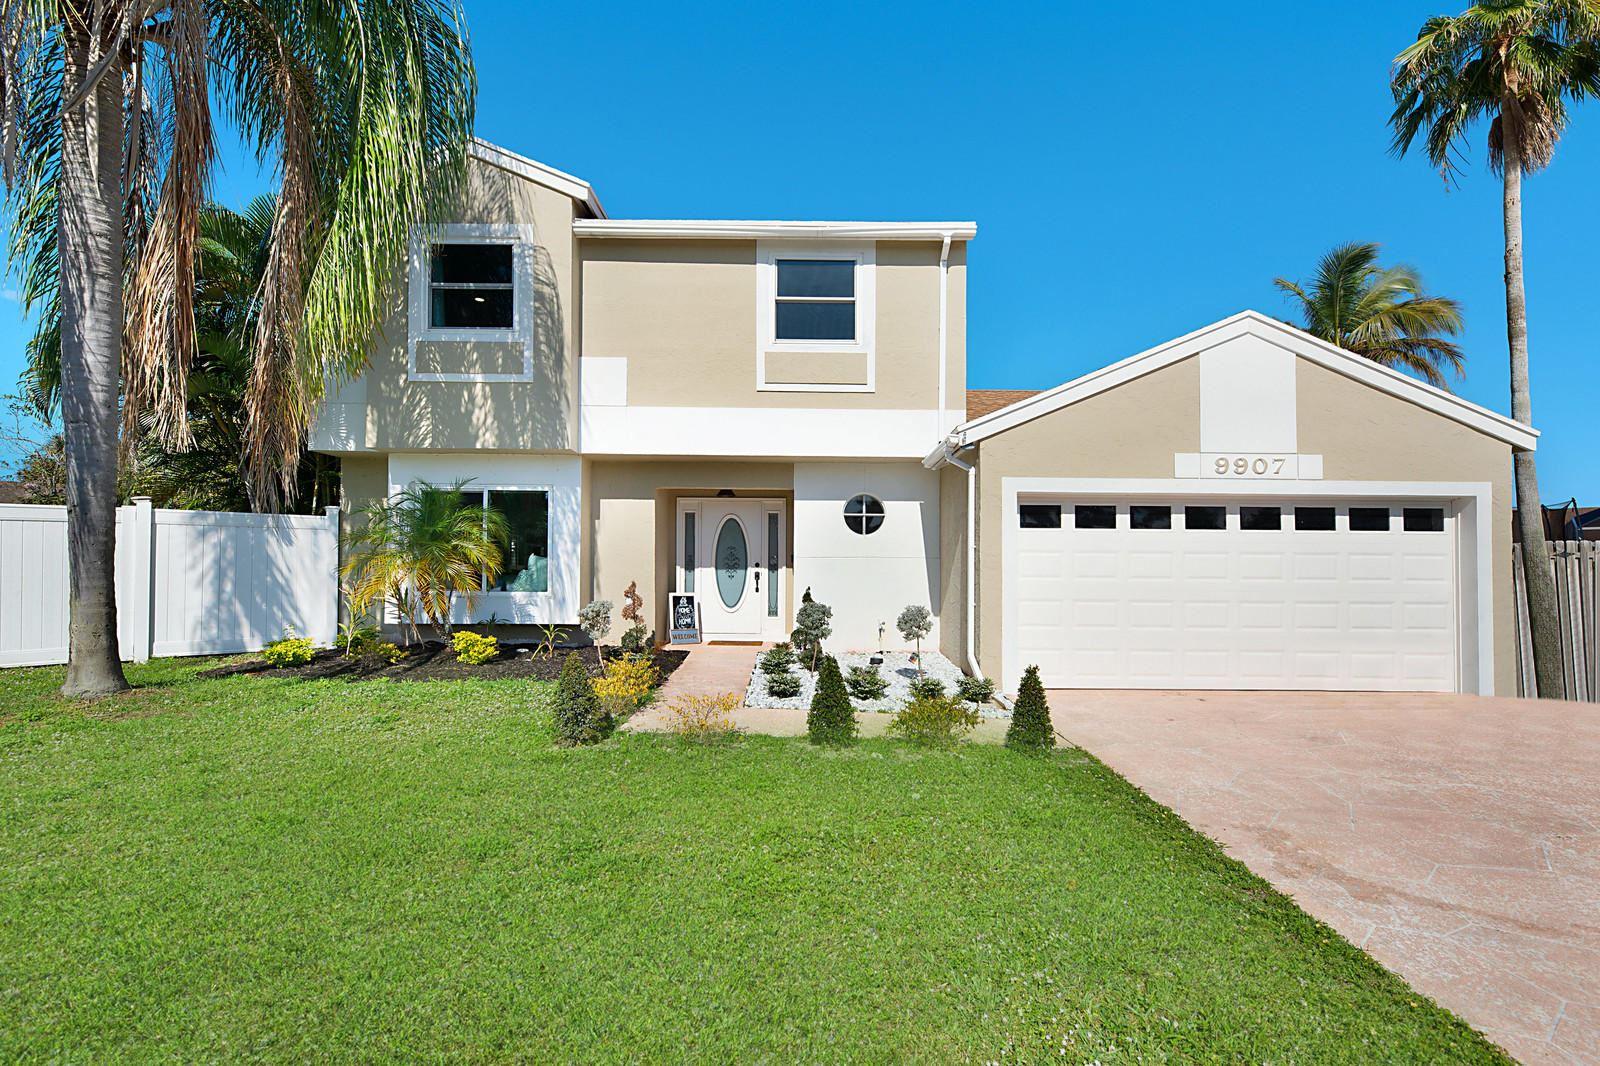 9907 Moss Pond Drive, Boca Raton, FL 33496 - #: RX-10605494